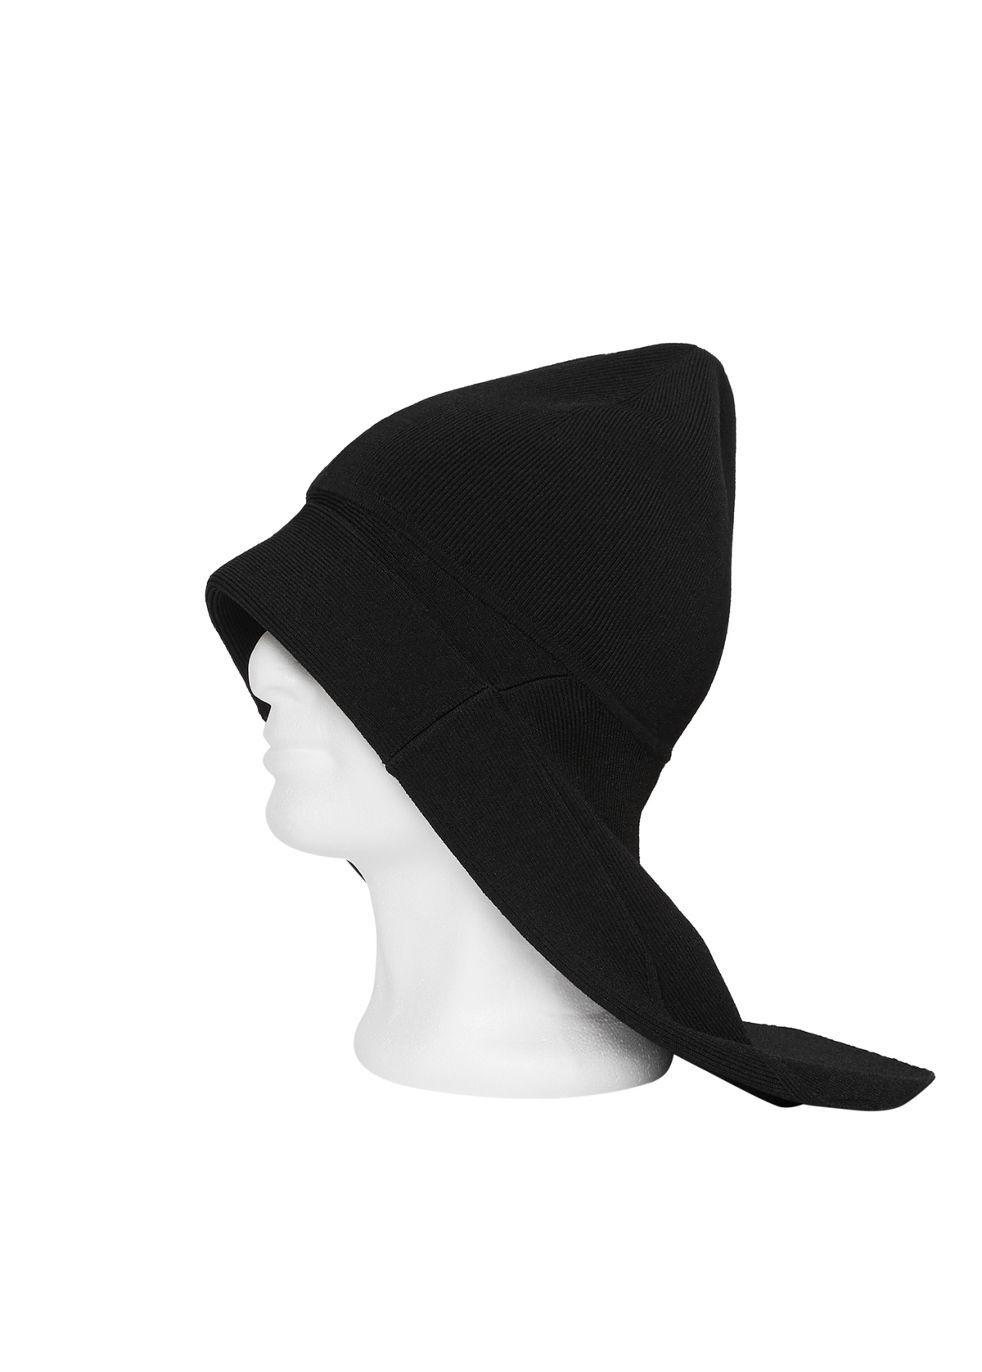 6d1b710ea9cce Designer Beanies - Women s Luxury Hats - Harvey Nichols